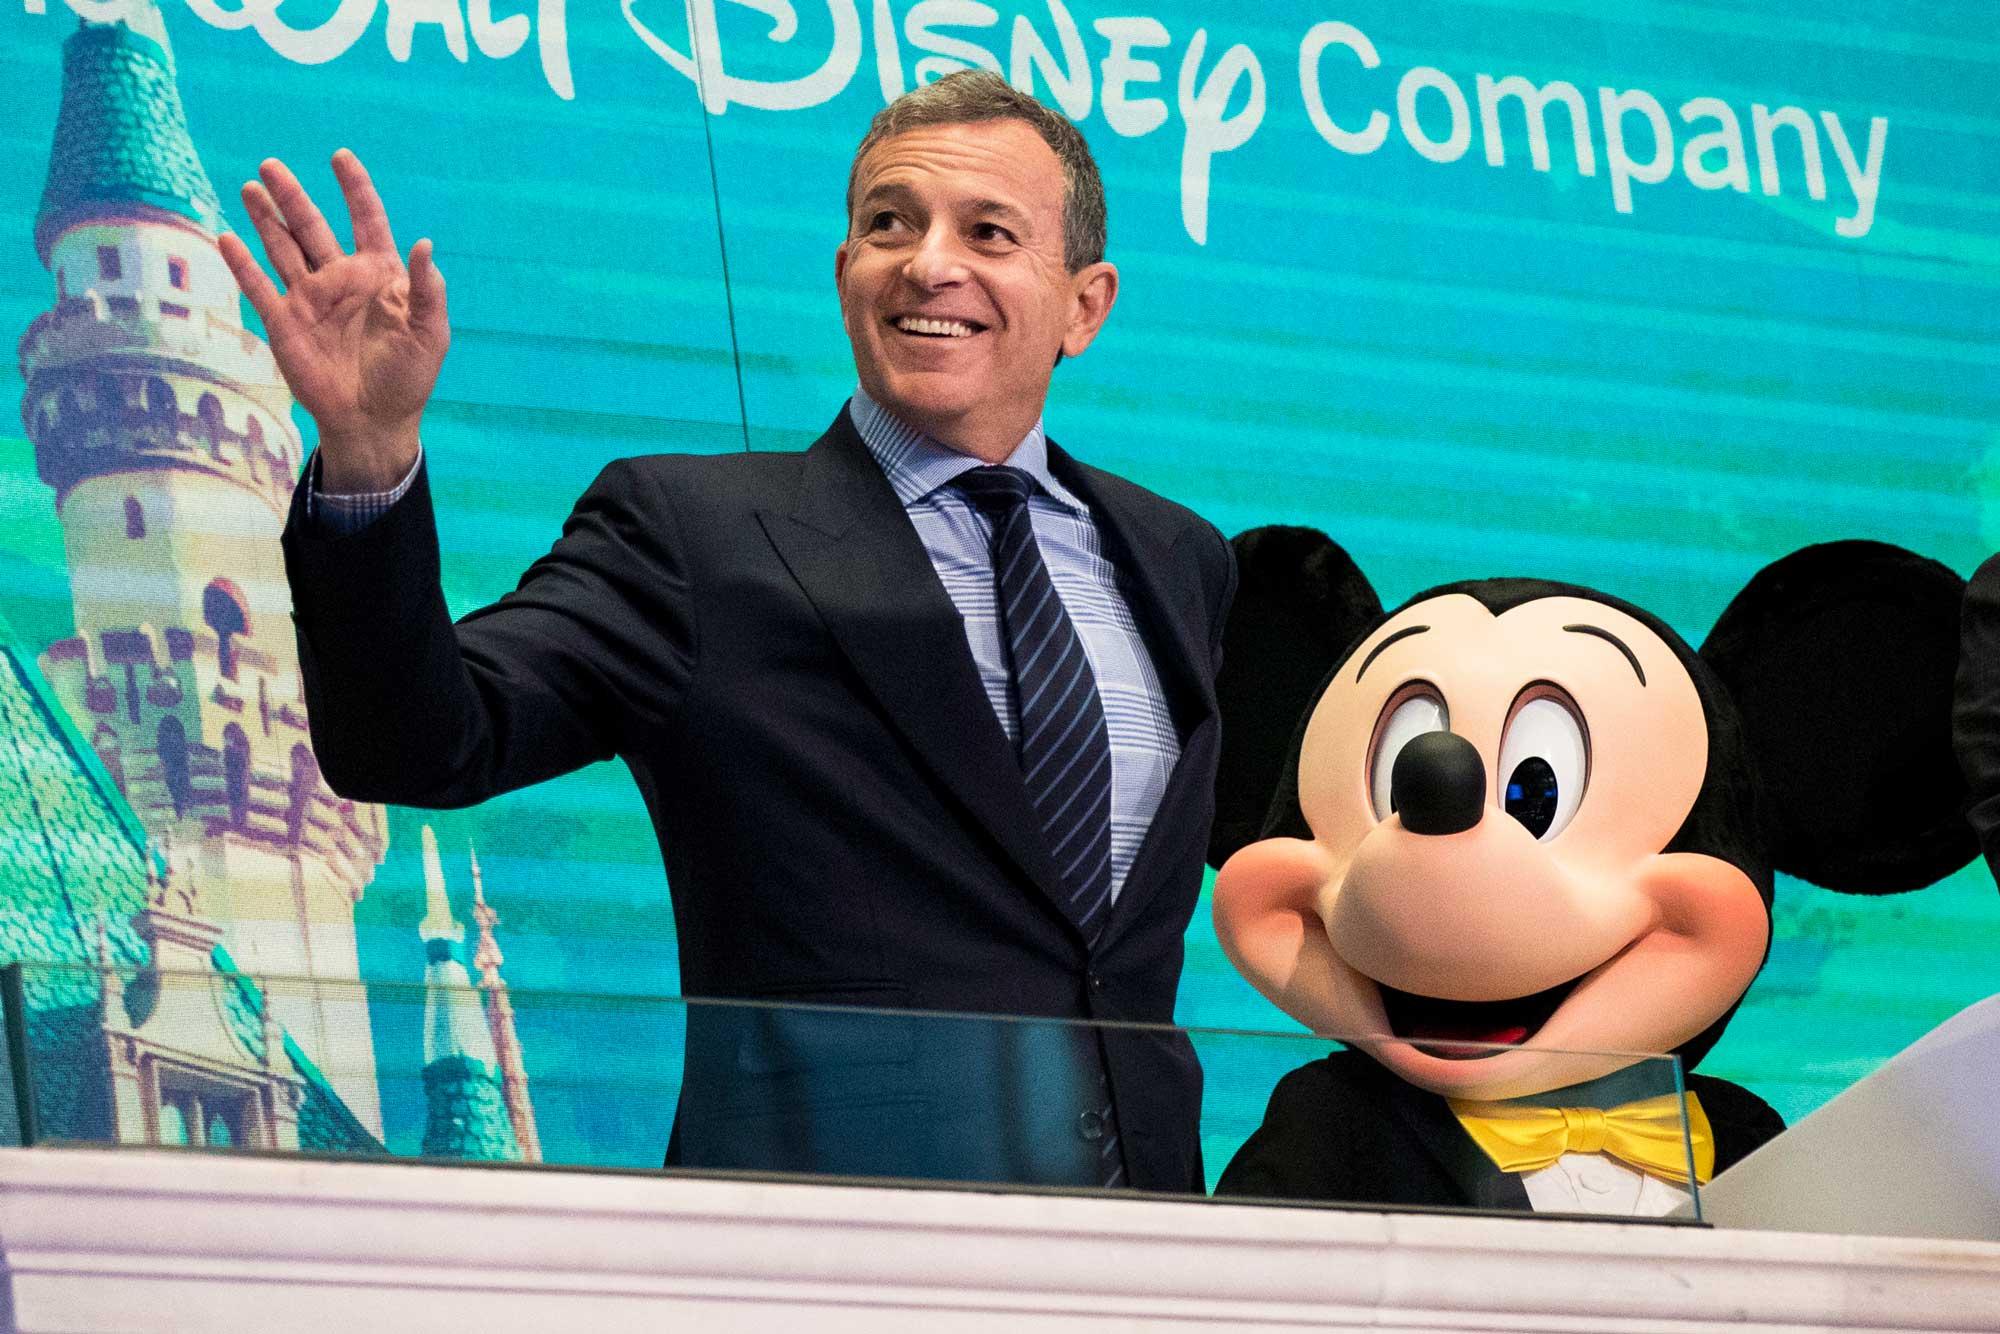 Disney To Buy 21st Century Fox Assets For 52 4 Billion In Stock